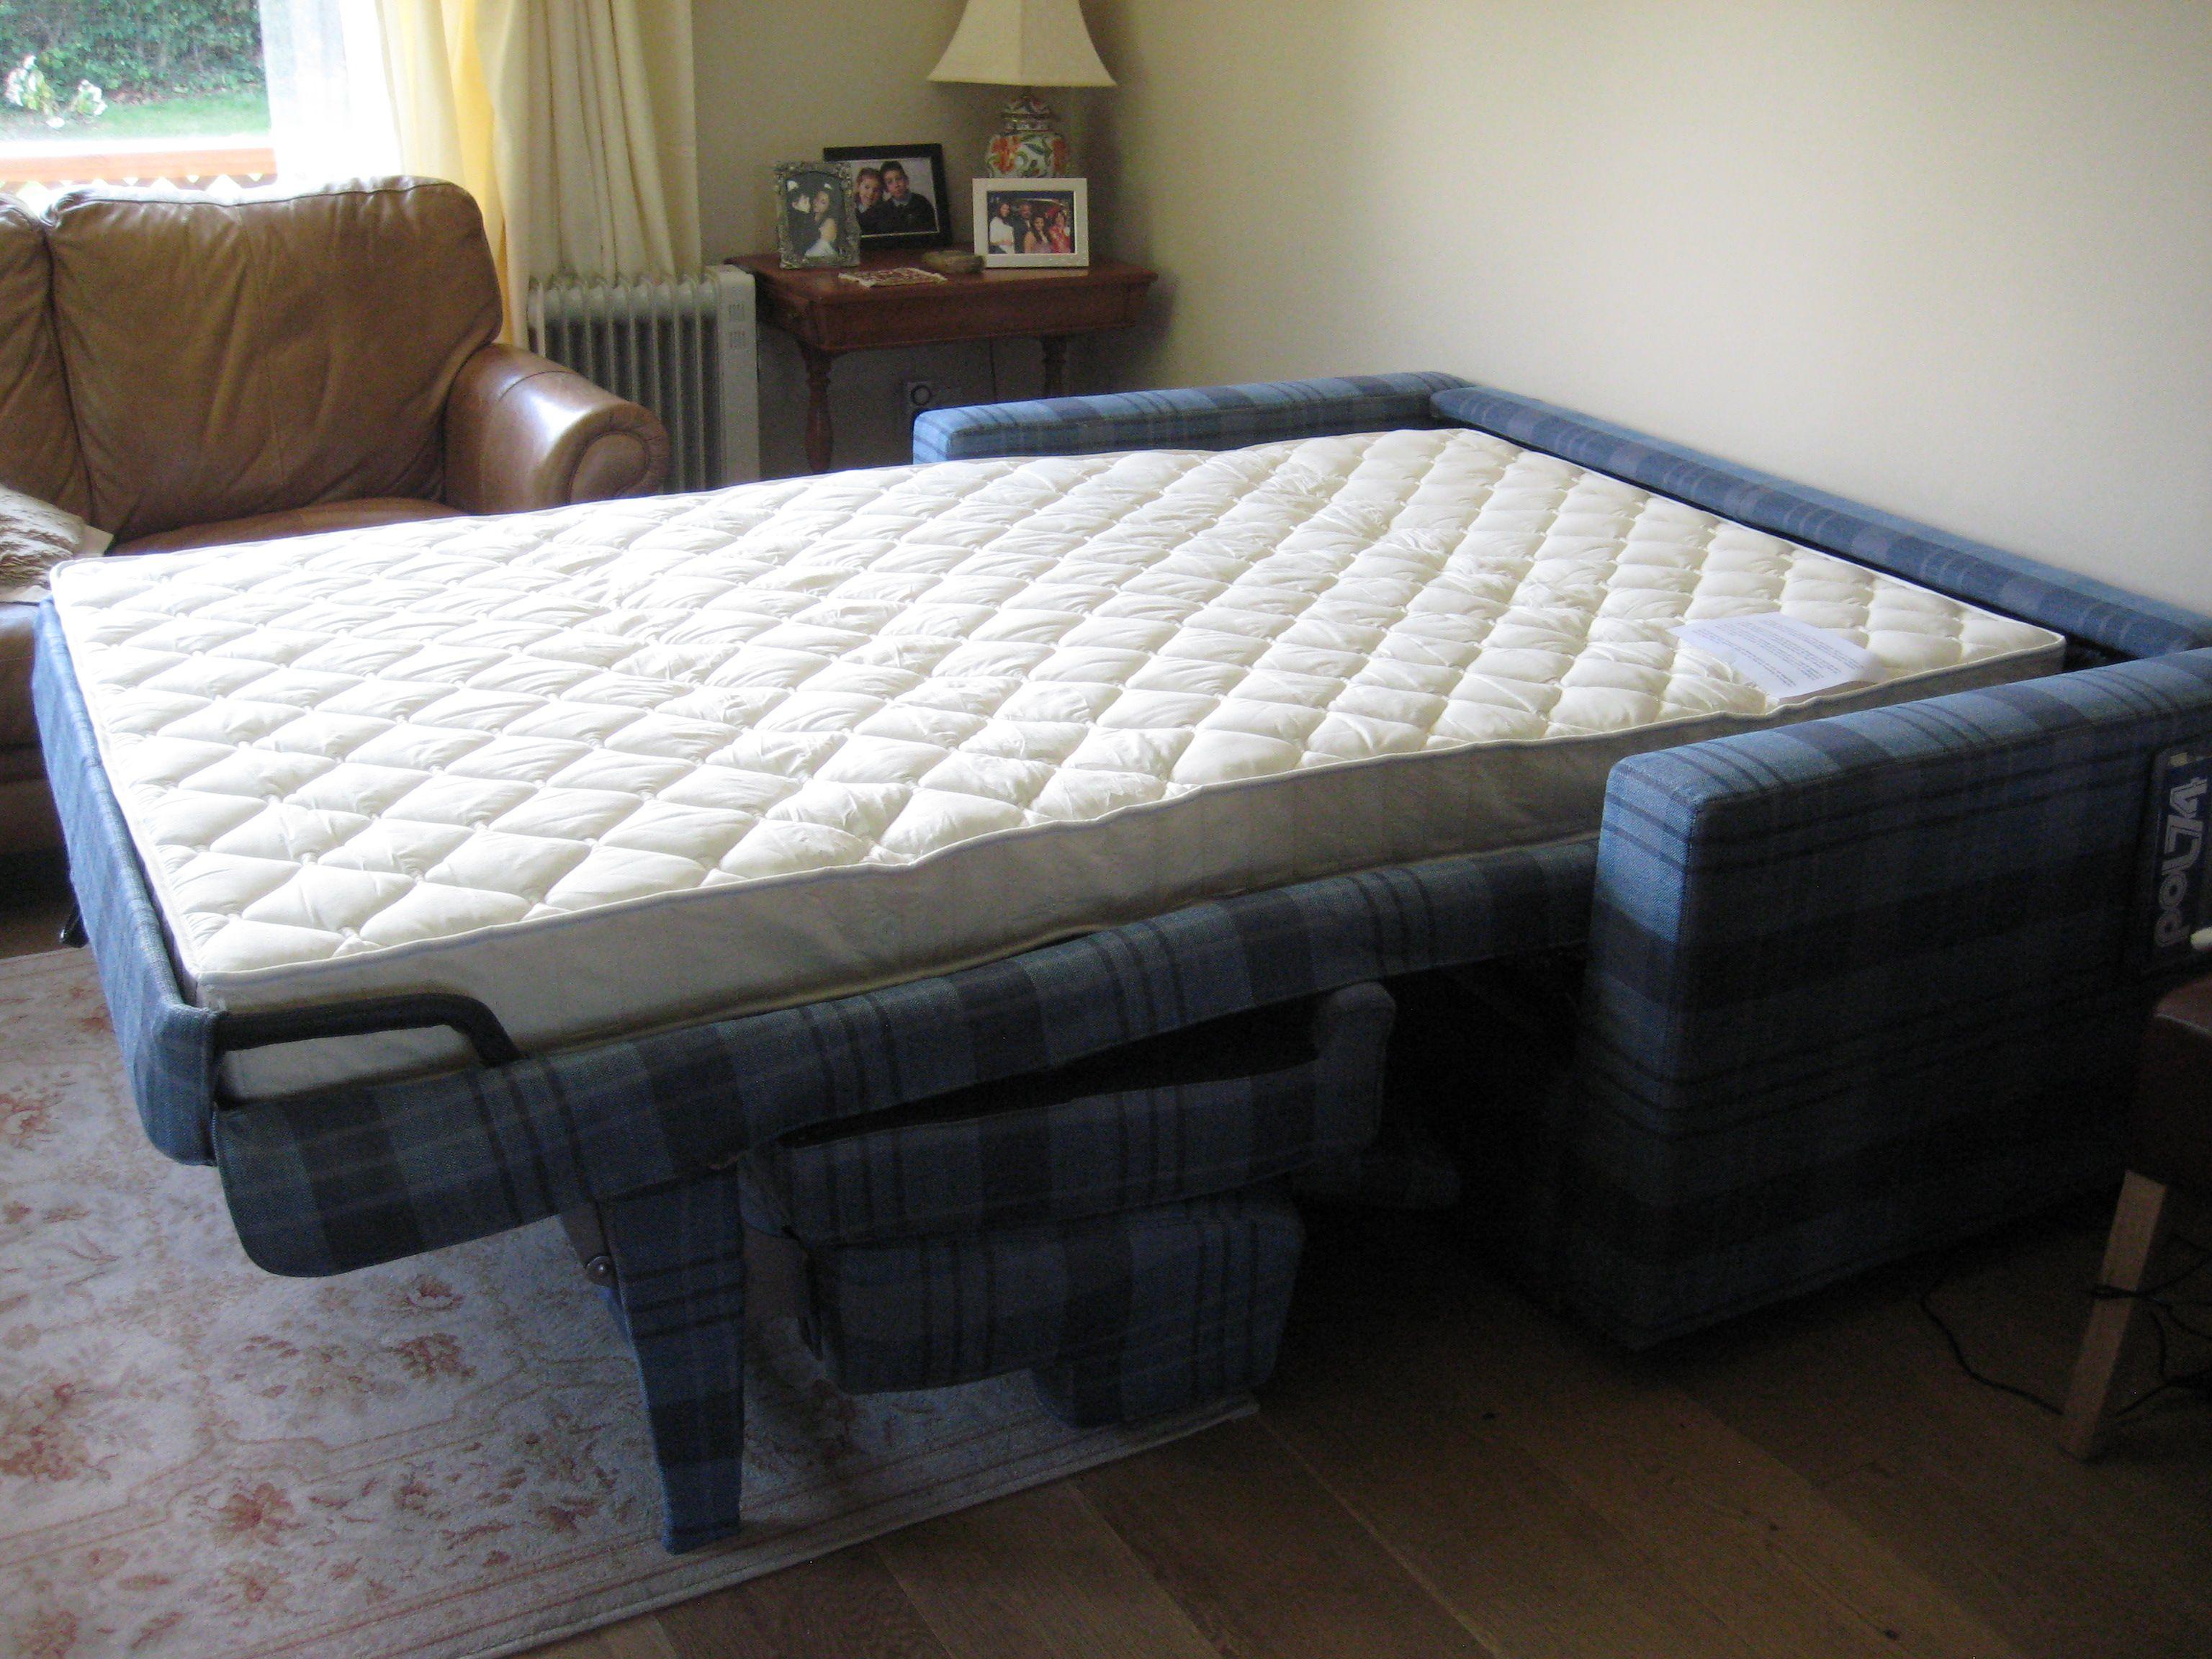 Lario Luxury Sofa Bed Fully Opened With Pocket Sprung Mattress  ~ Sofa Sleeper Mattress Pad